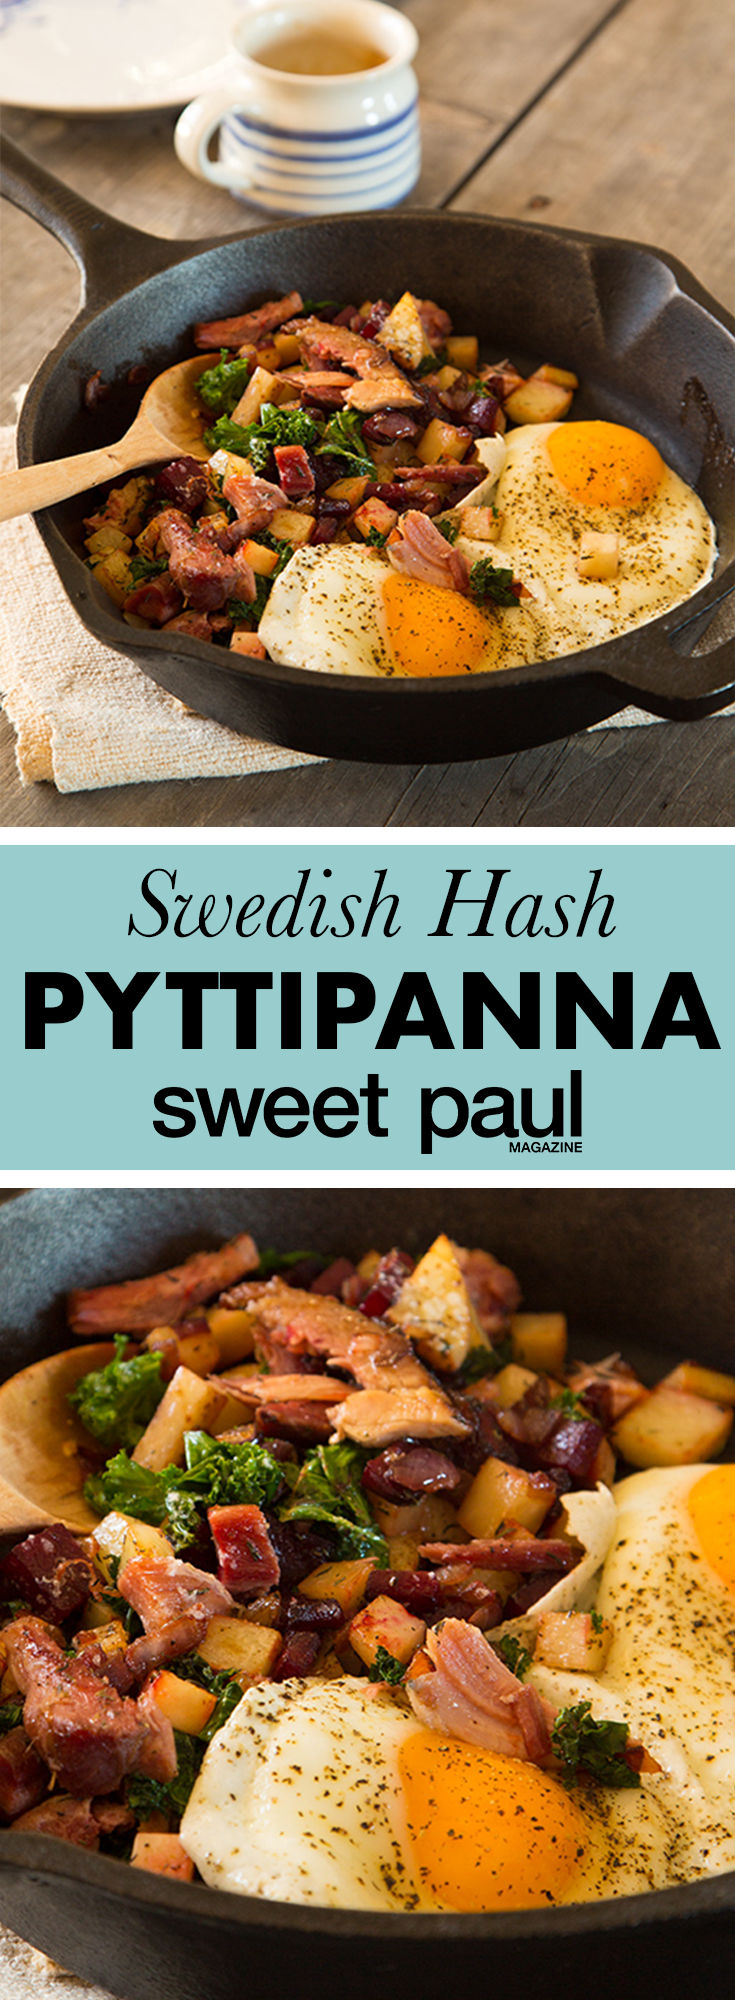 Pyttipanna Swedish Hash (With images) Swedish recipes